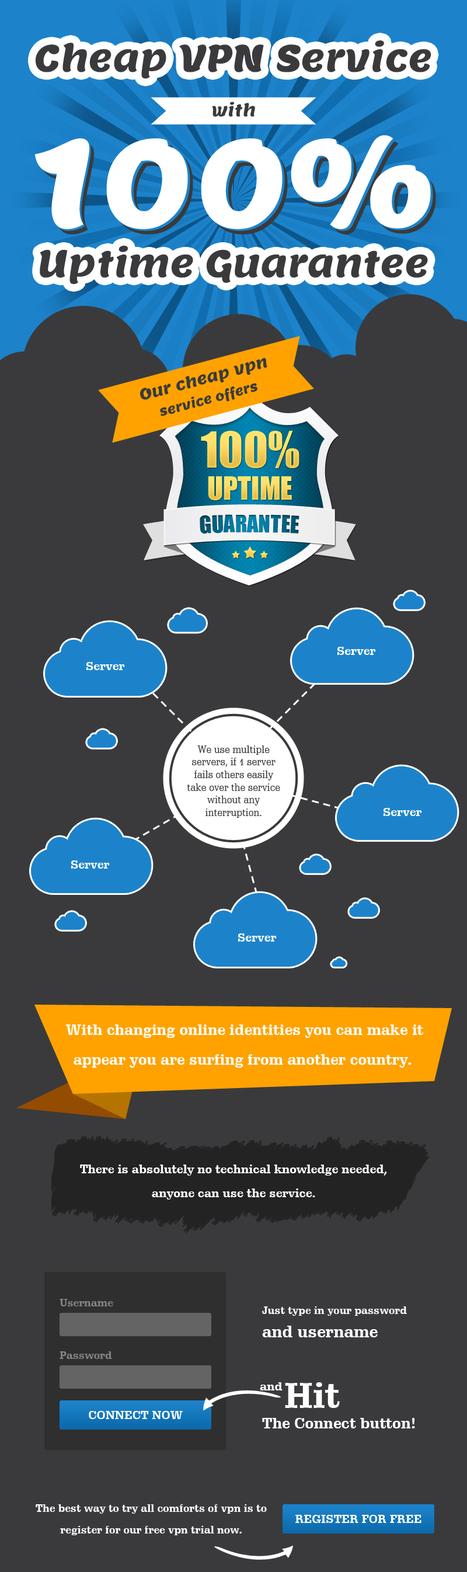 Get Cheap VPN Services from Dream VPN | VPN Services | Scoop.it